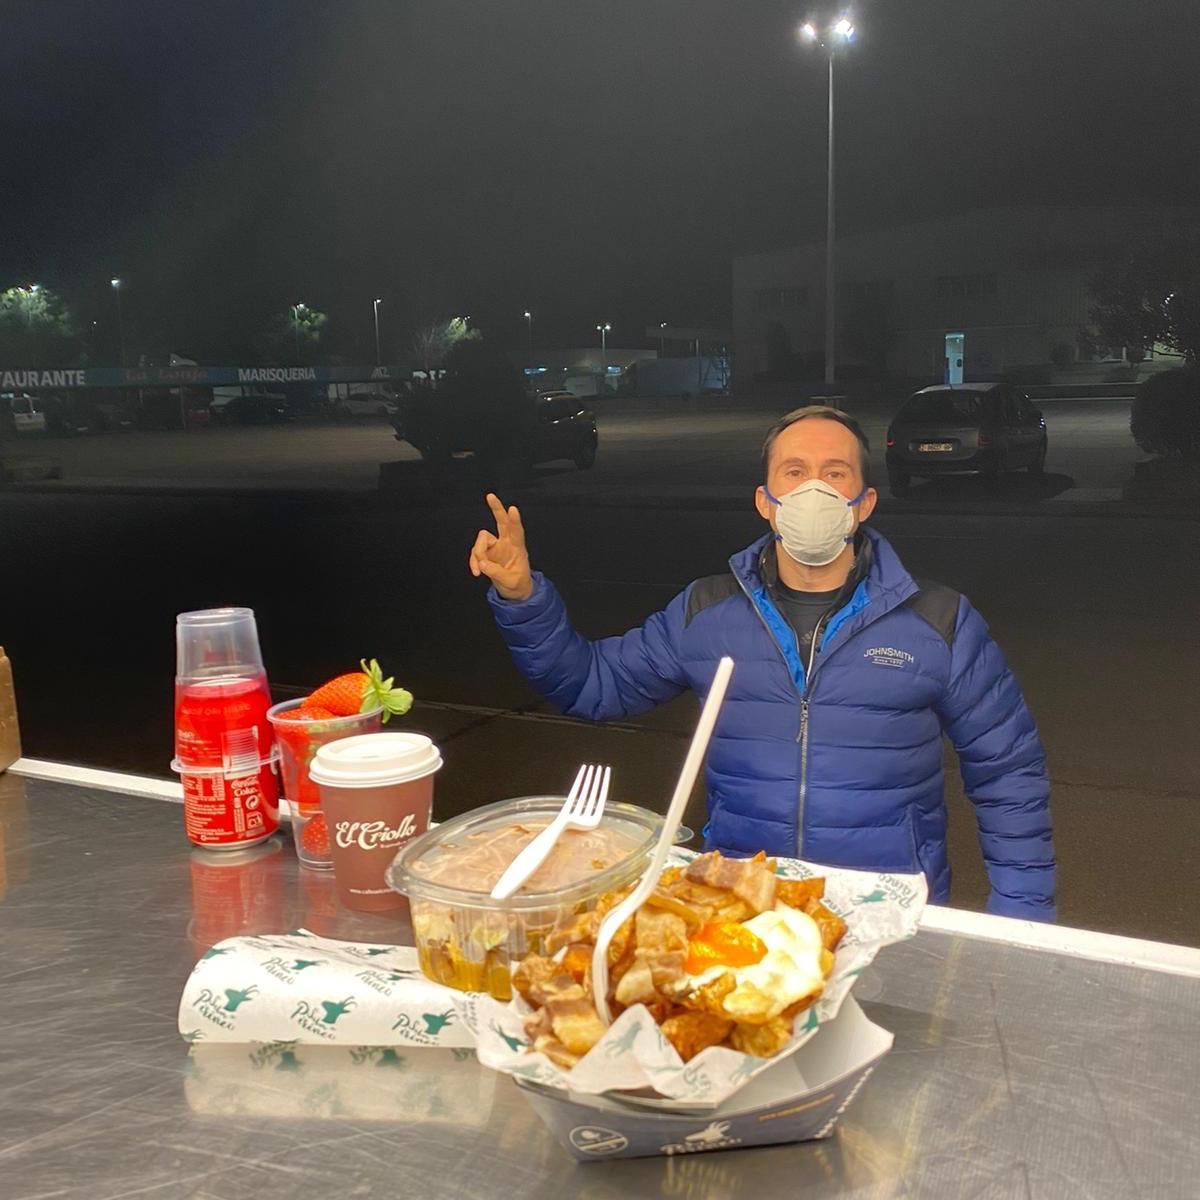 Servicio de cenas en MercaZaragoza